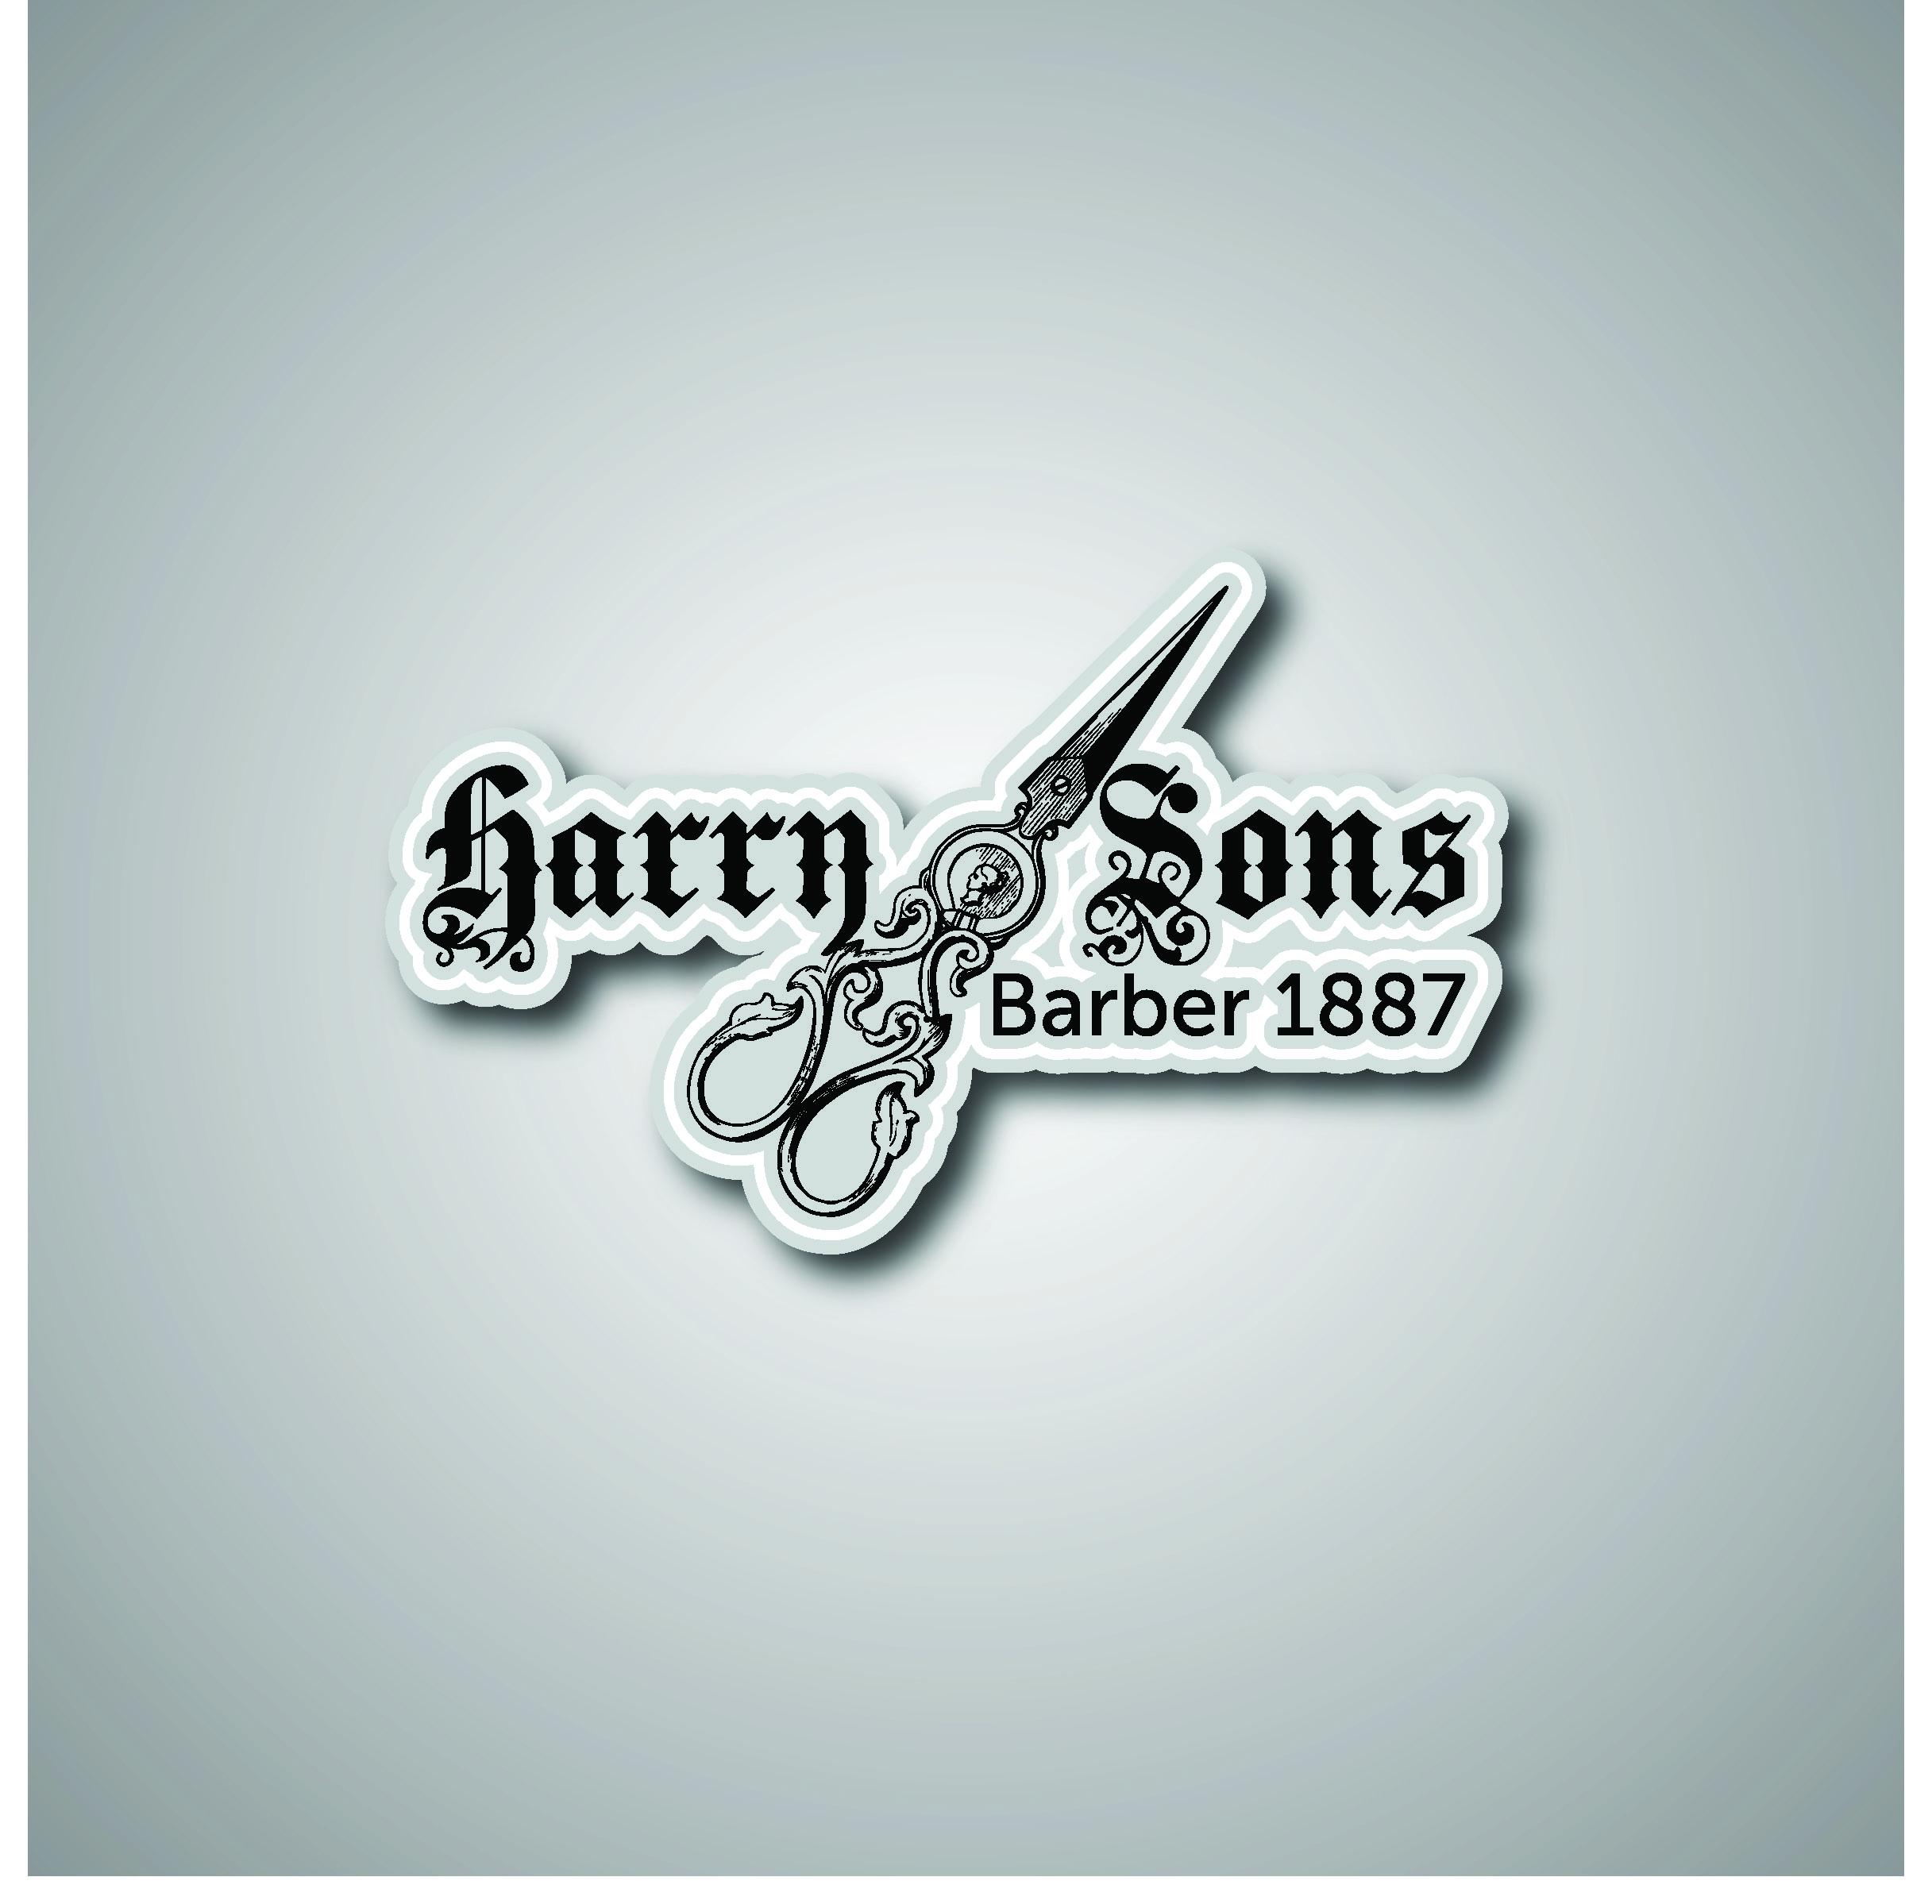 Logo Design by Sampath Gunathilaka - Entry No. 78 in the Logo Design Contest Captivating Logo Design for Harry and Sons Barber.